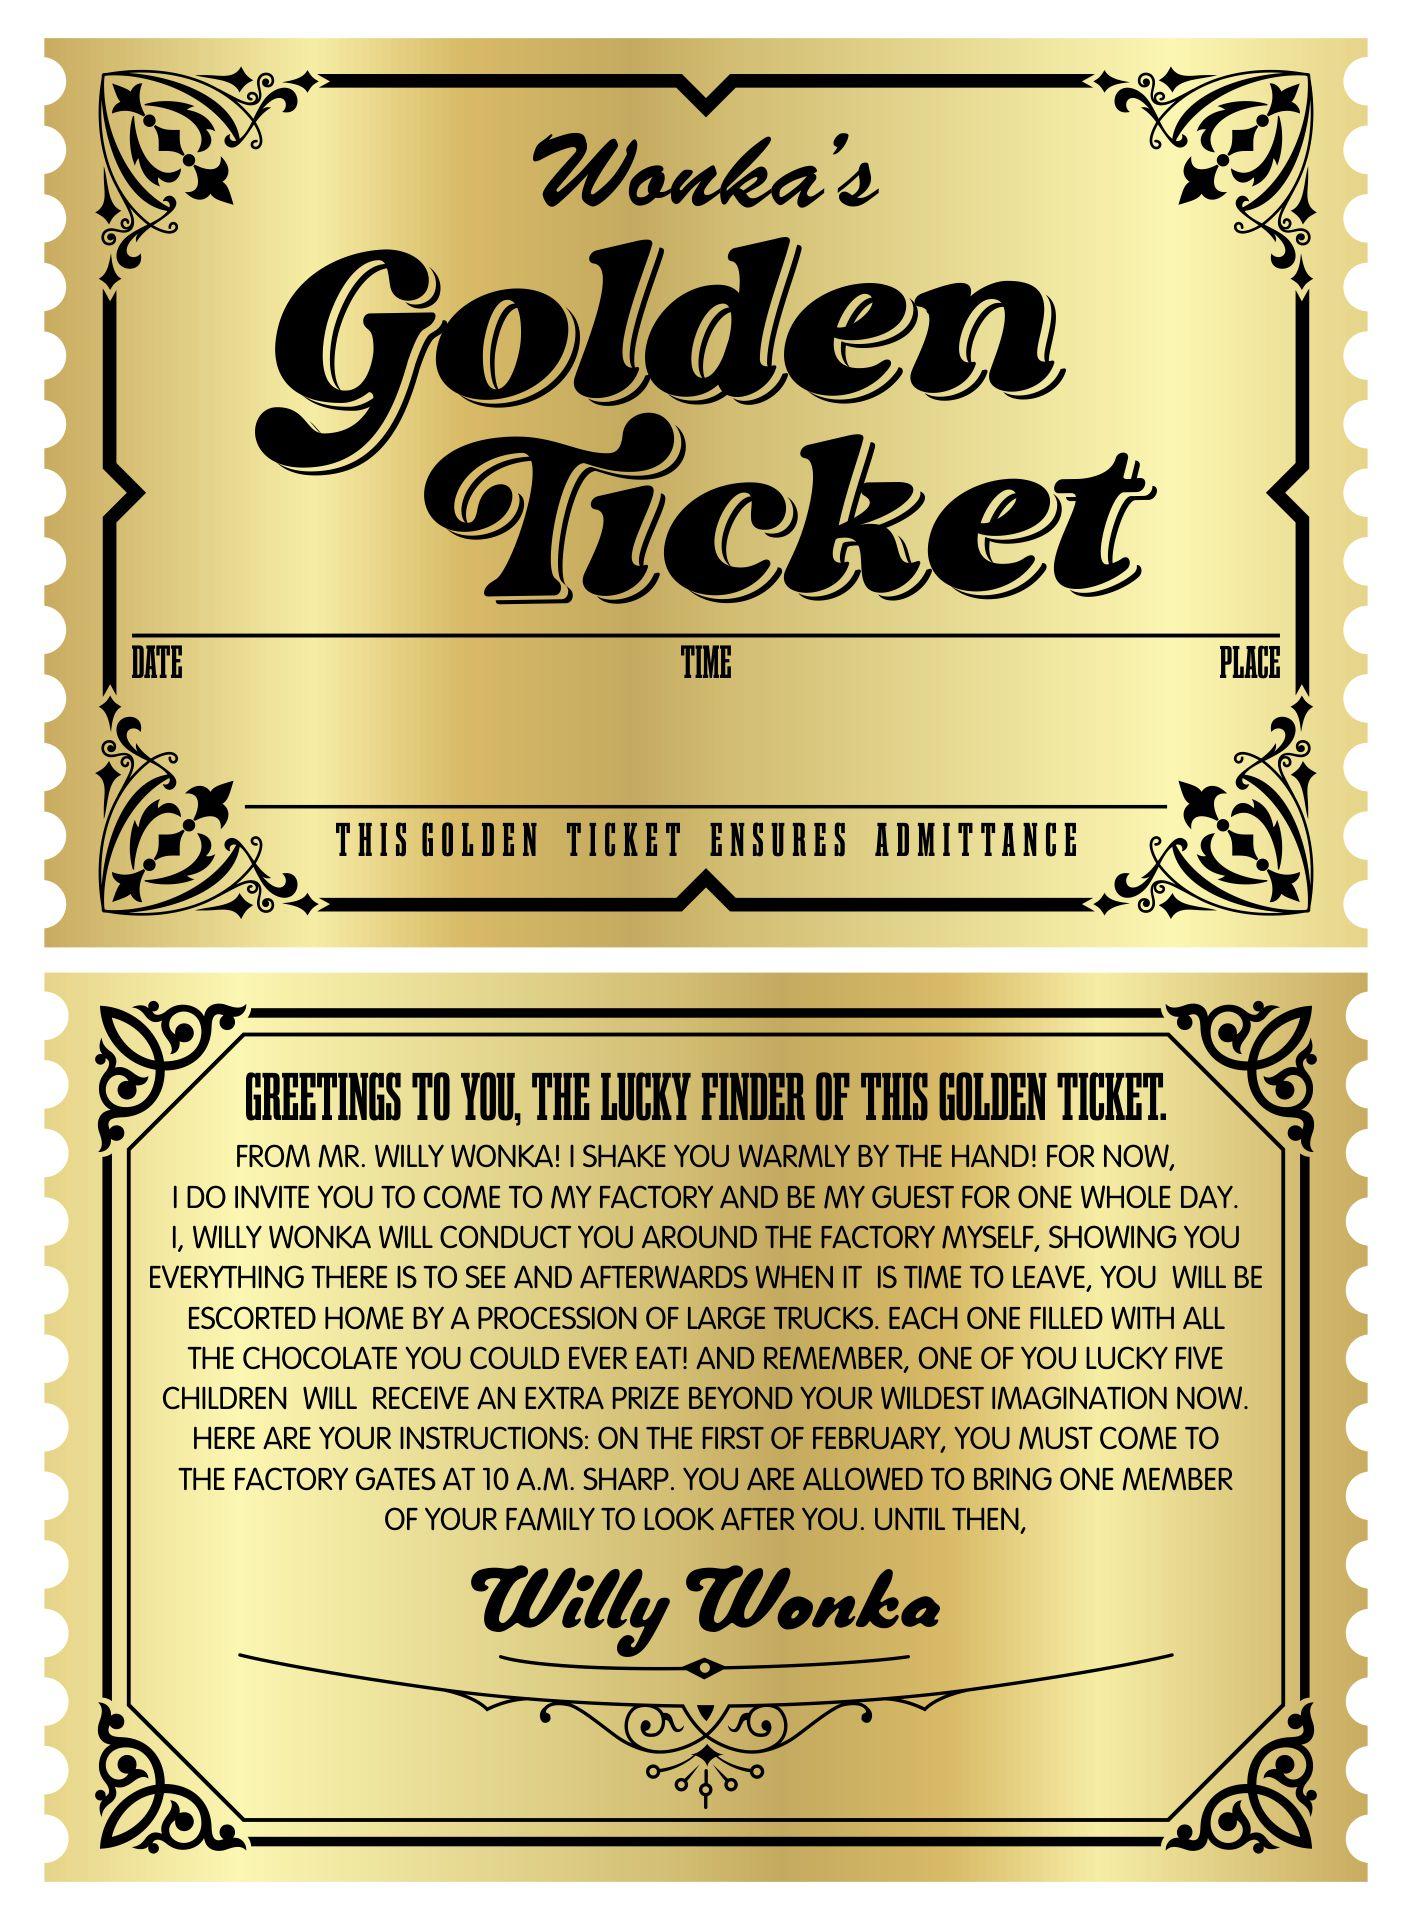 Wonka Golden Ticket Template Word